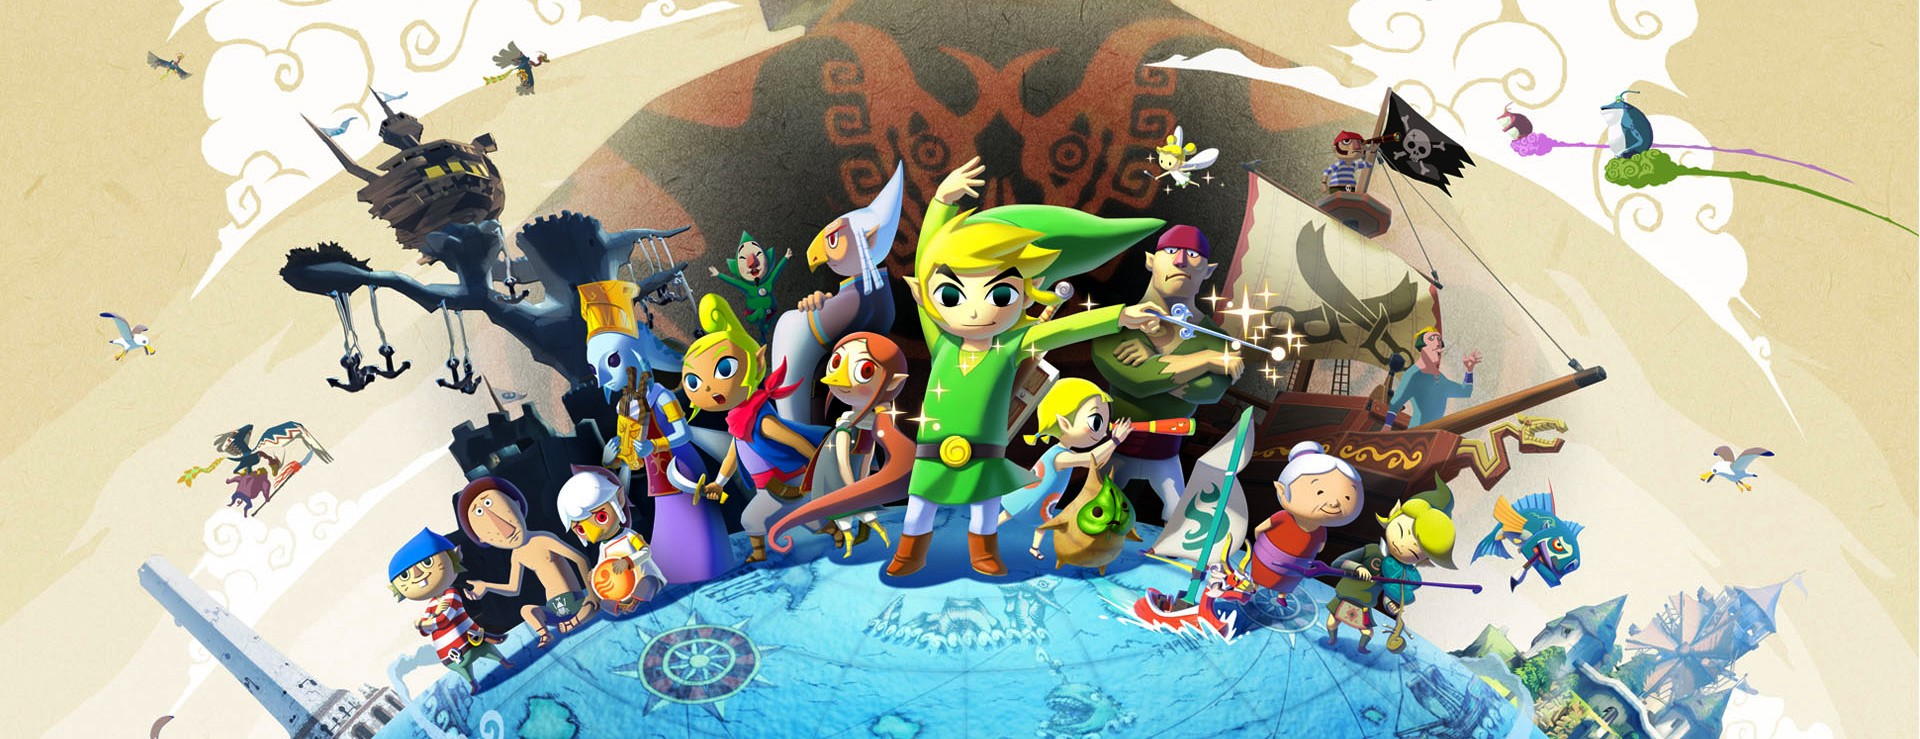 Twilight Princess Wind Waker Hd Kommen 2021 Fur Nintendo Switch Behaupten Jedenfalls Insider Nintendo Connect